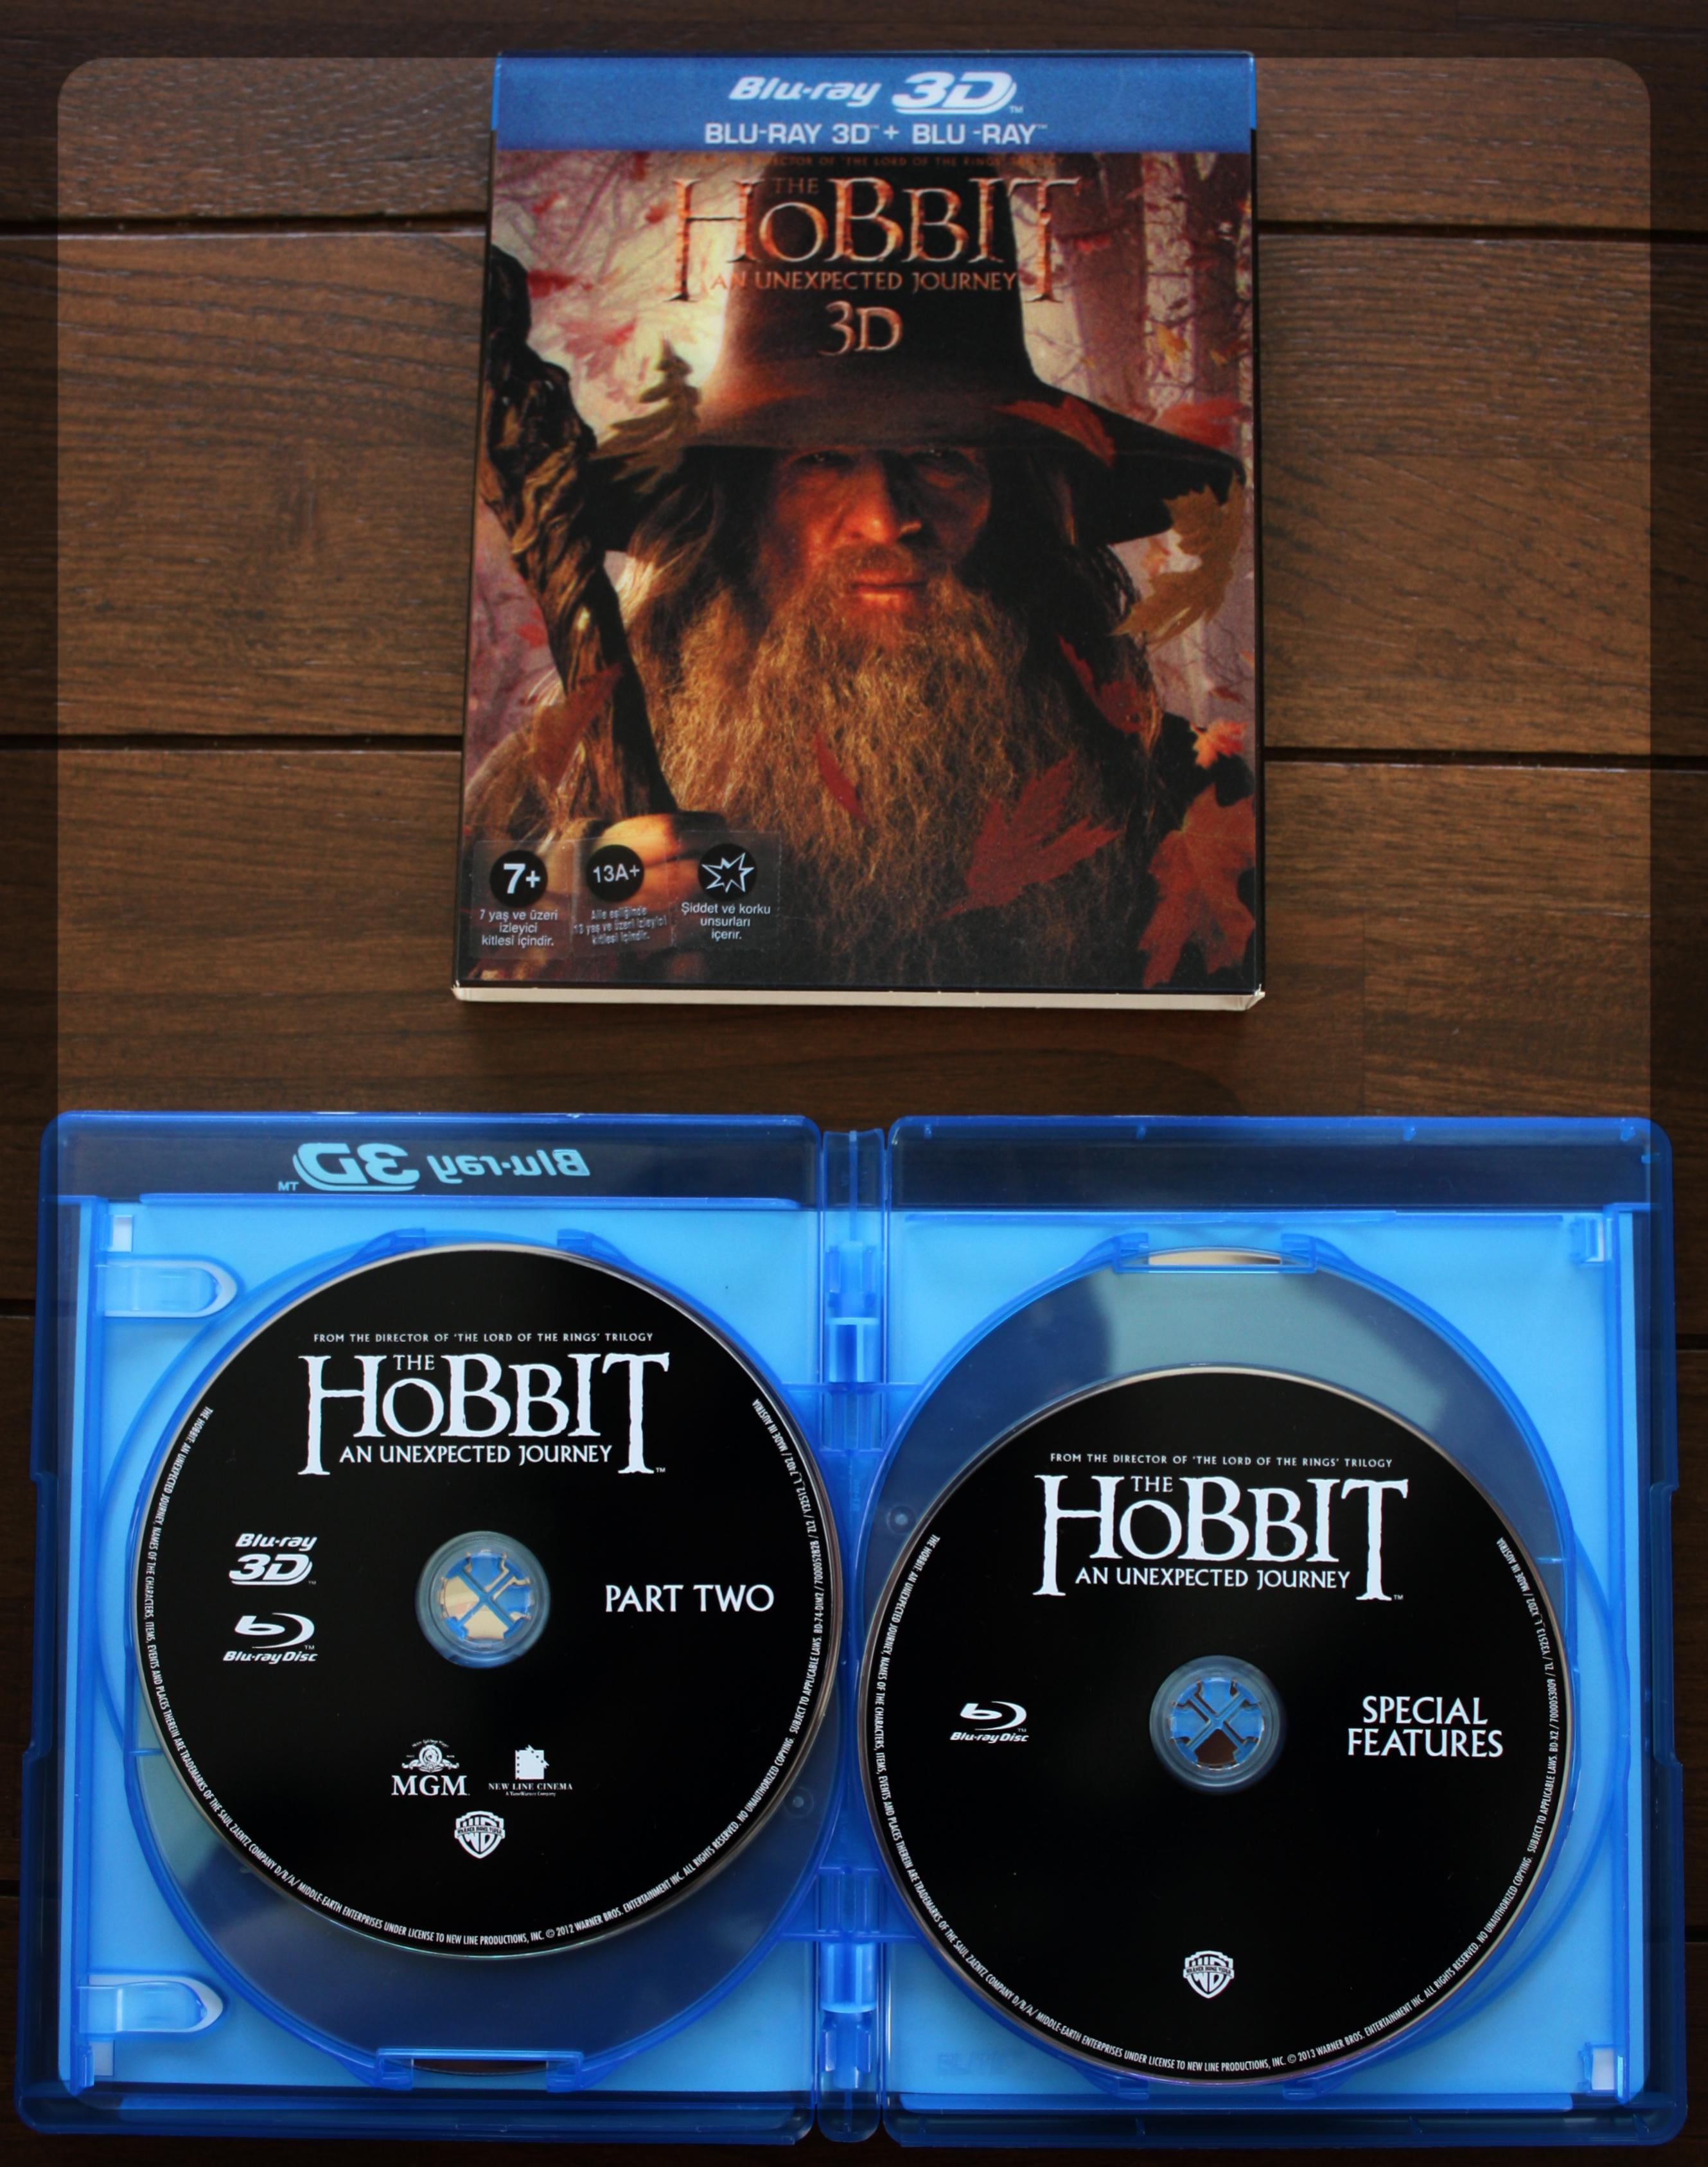 Hobbit, beklenmeyen Yolculuk